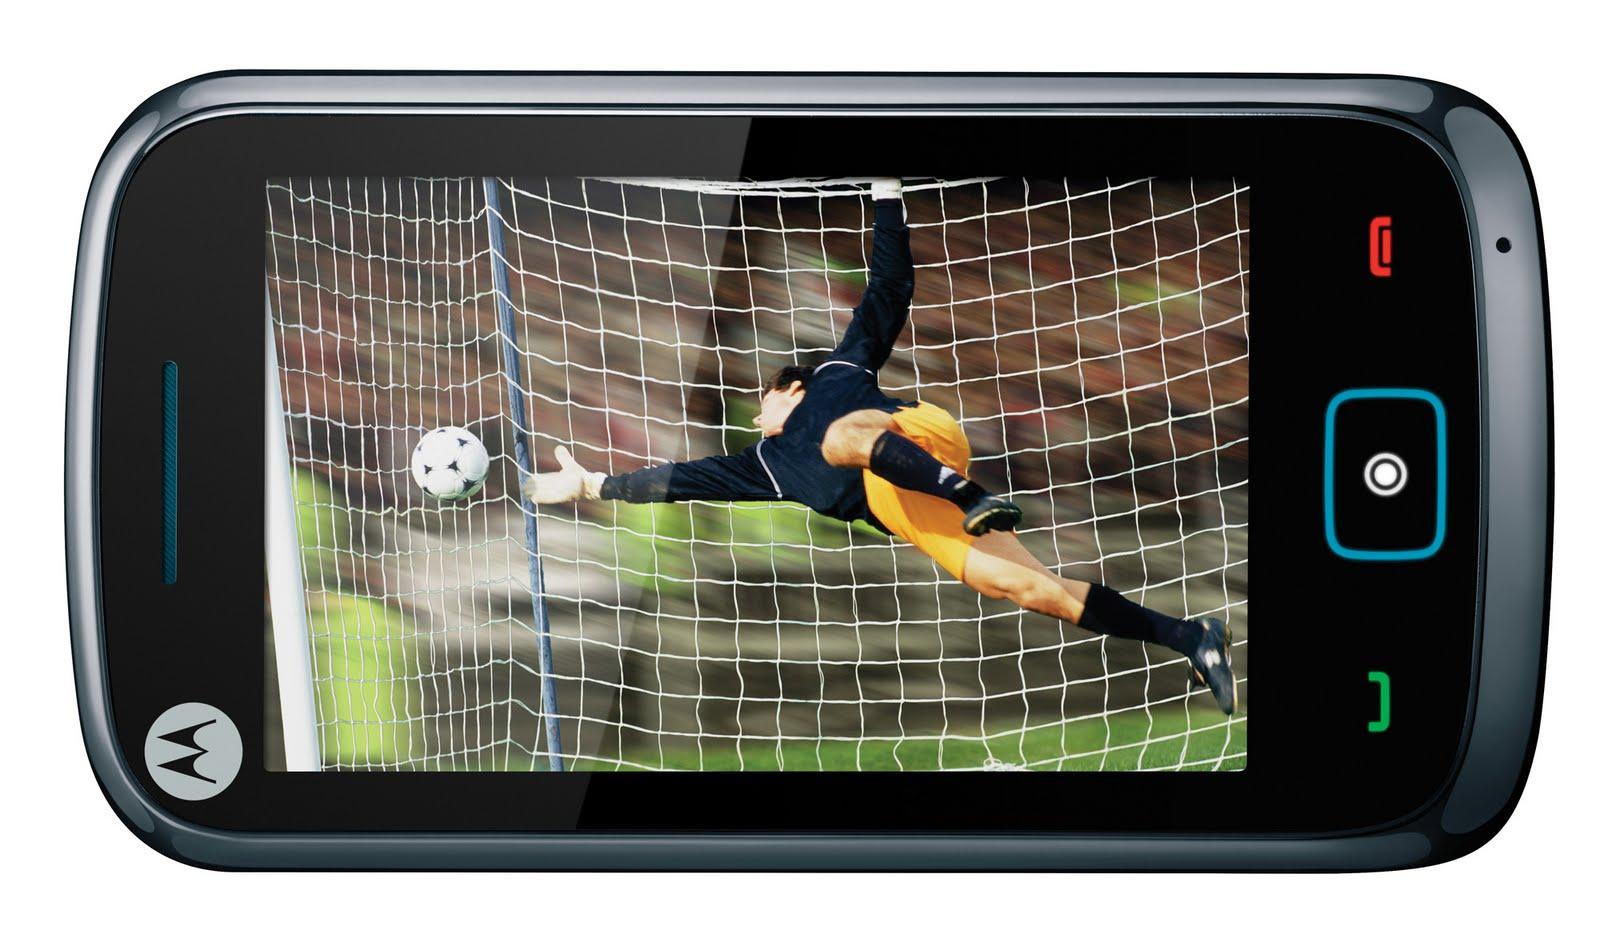 http://2.bp.blogspot.com/-669oz3pEeZc/TaYggSD11LI/AAAAAAAABDk/XuBDLoaEnMc/s1600/Motorola+Ex+122+1+Great+cellular+phones.jpg